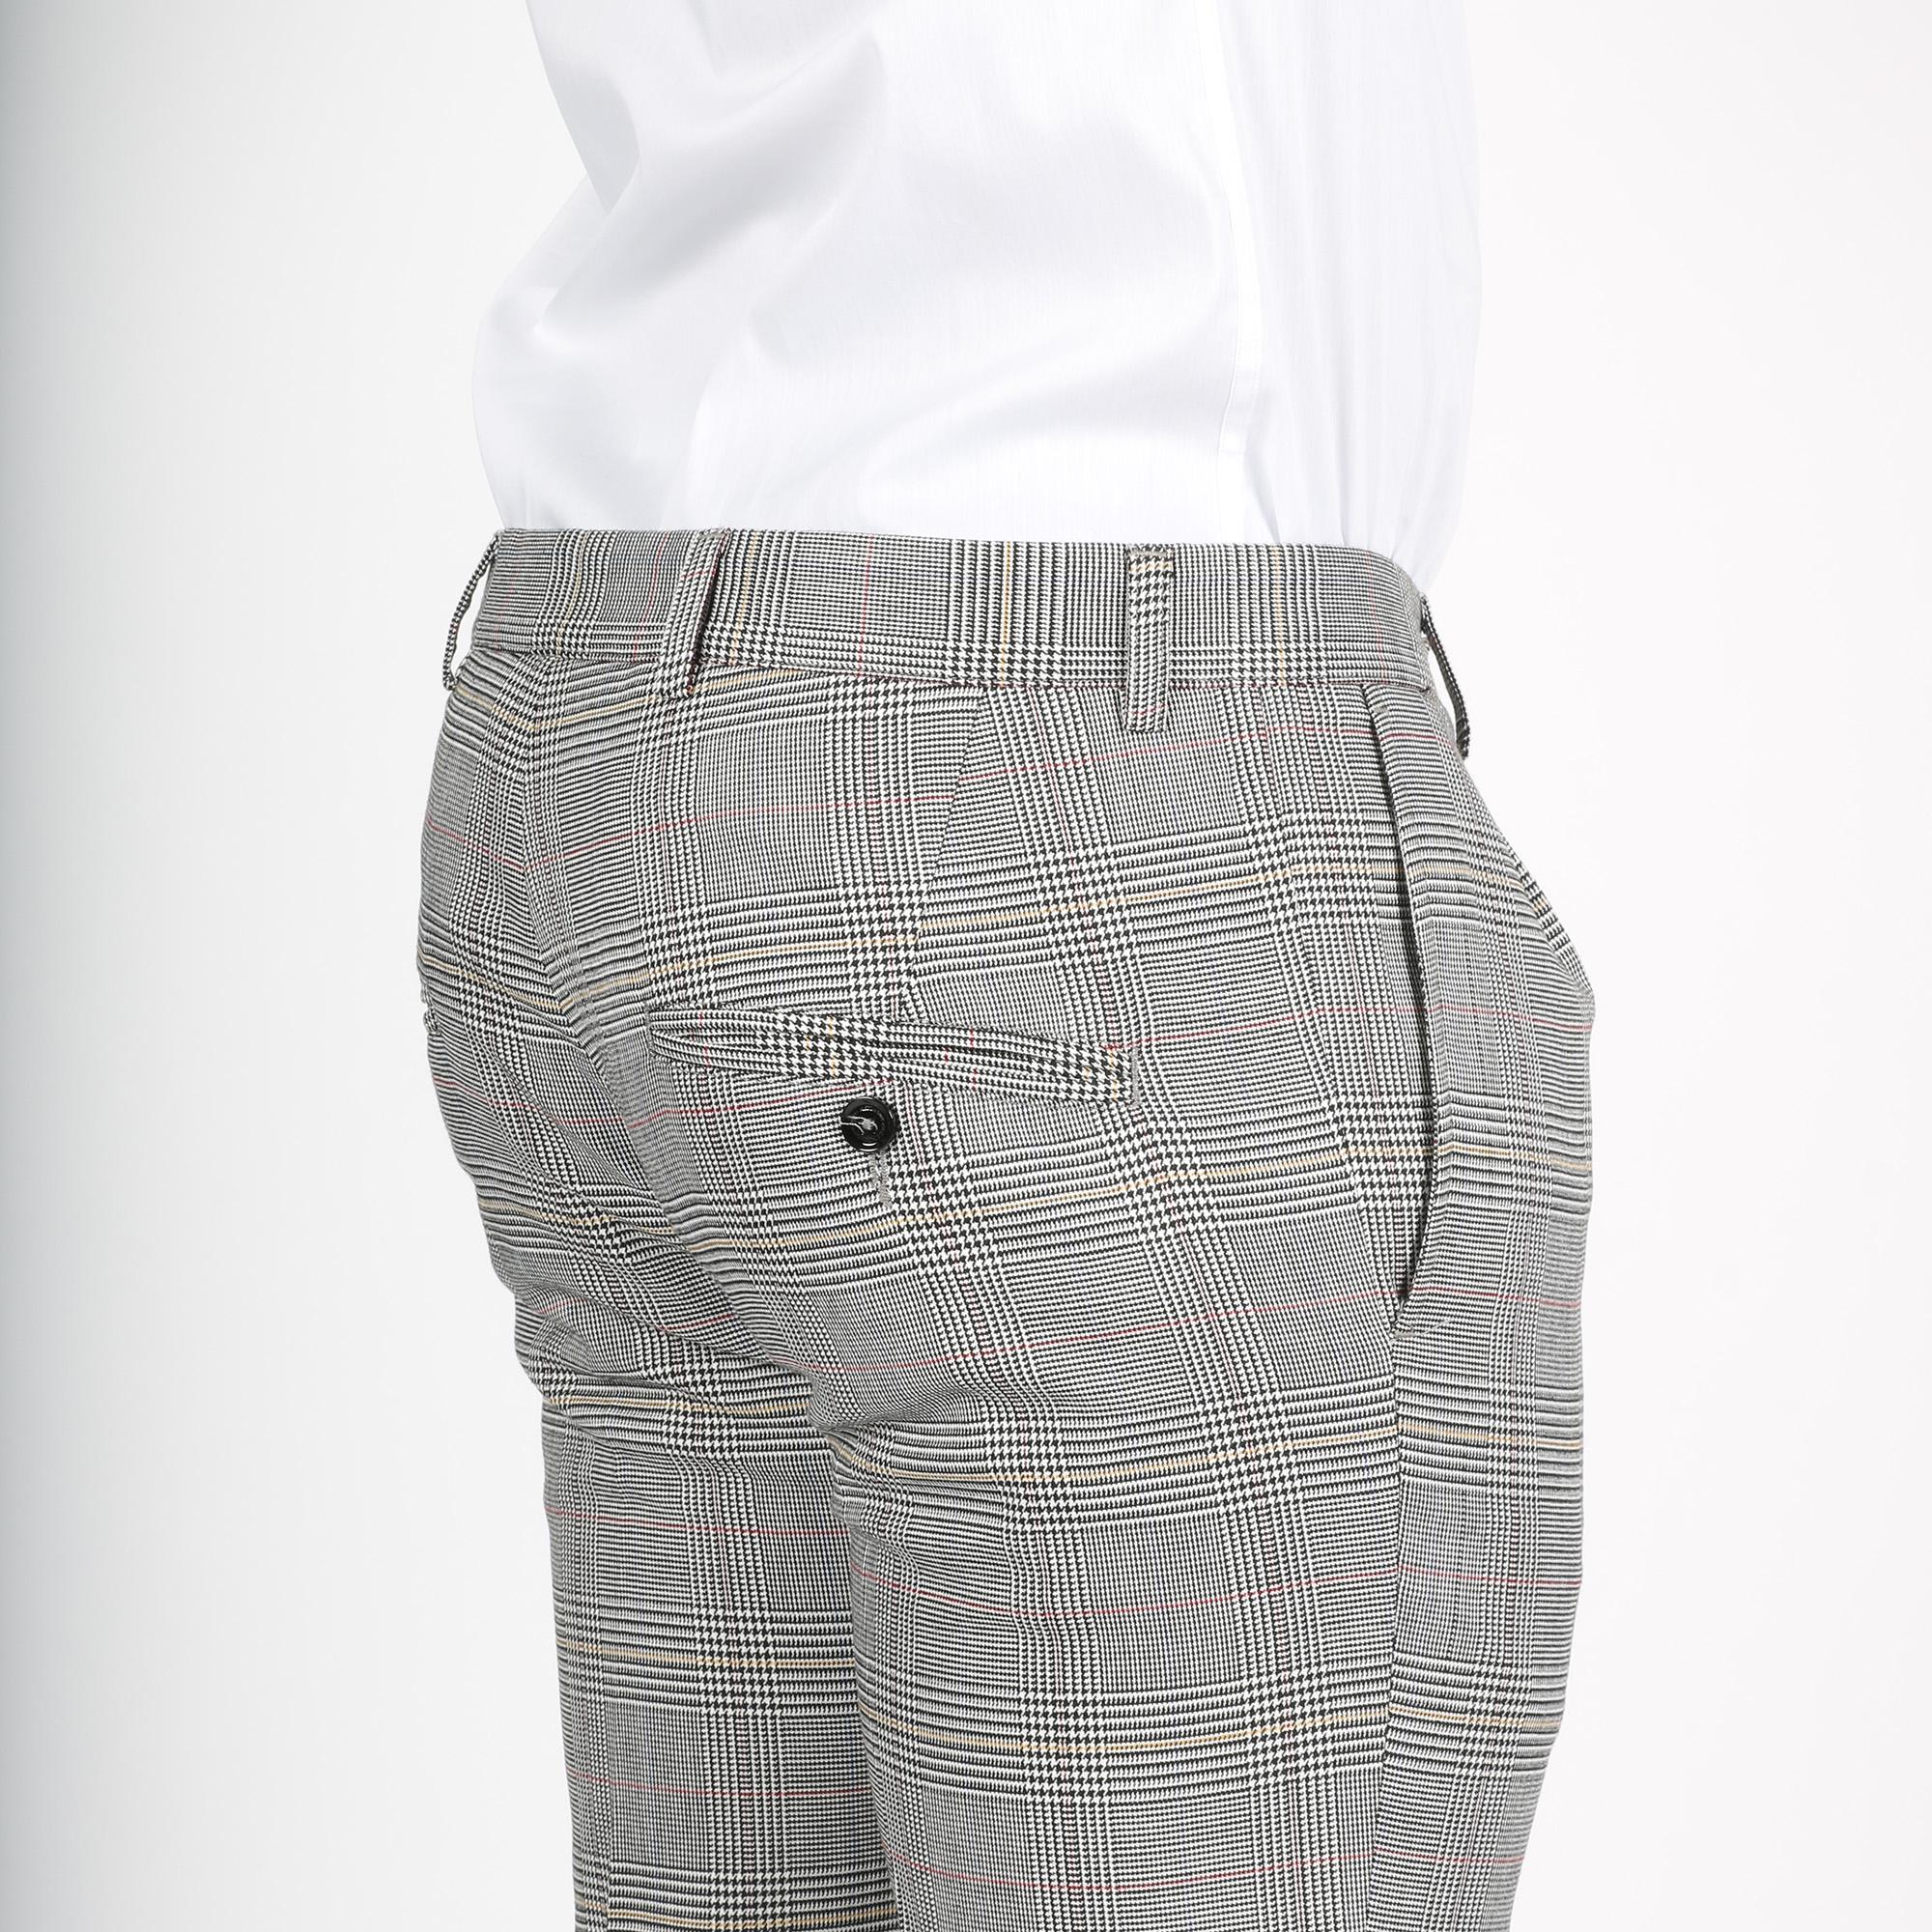 Pantalone spuma galles - Nero